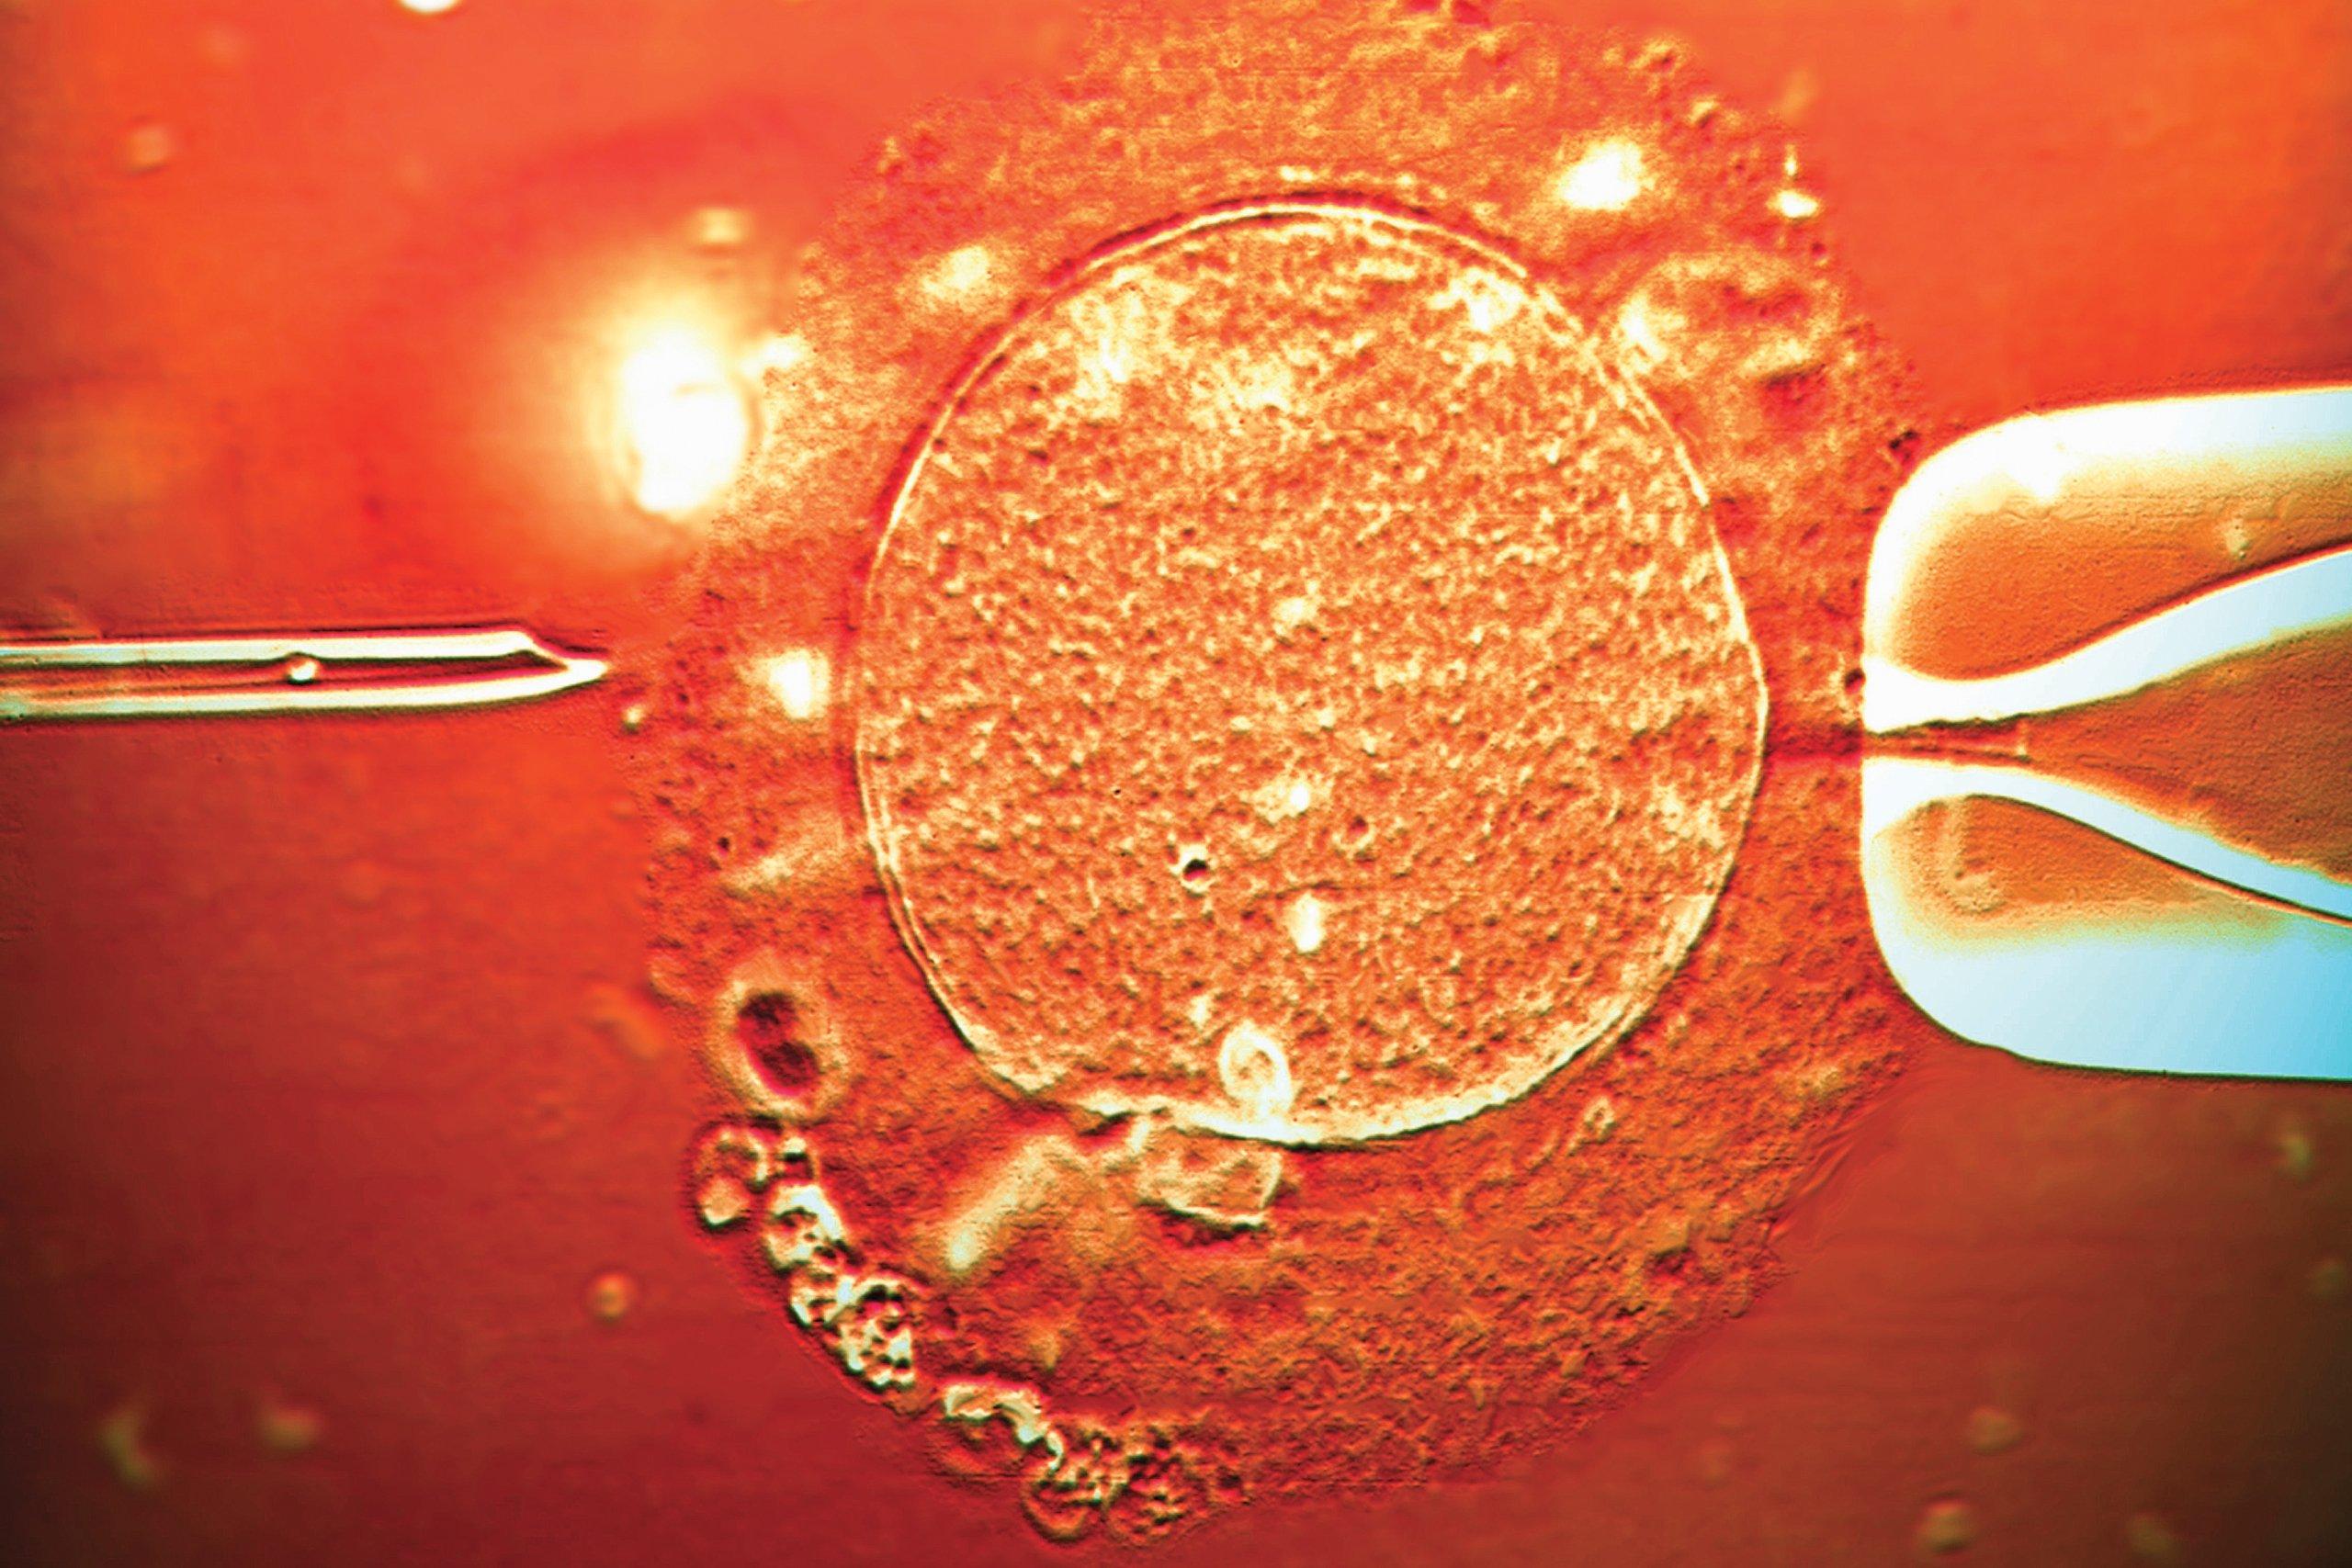 sepkowitz-nm0421-adopting-embryo-tease